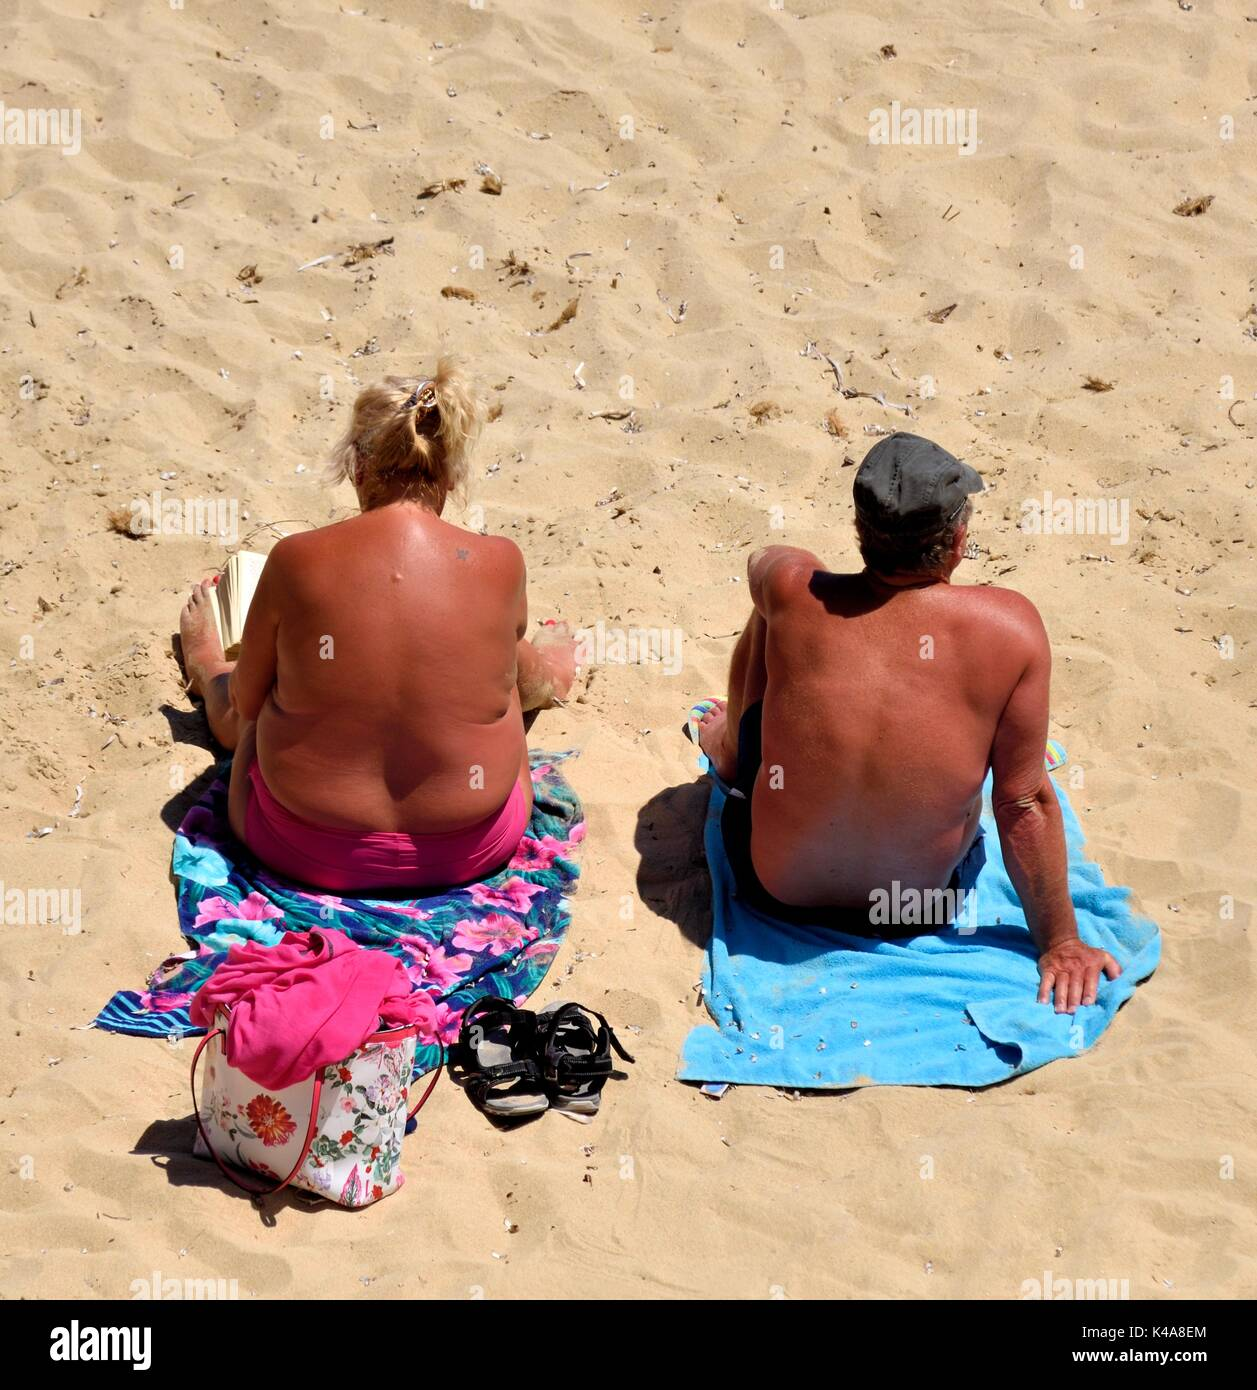 suntanned-couple-sunbathing-on-a-beach-m